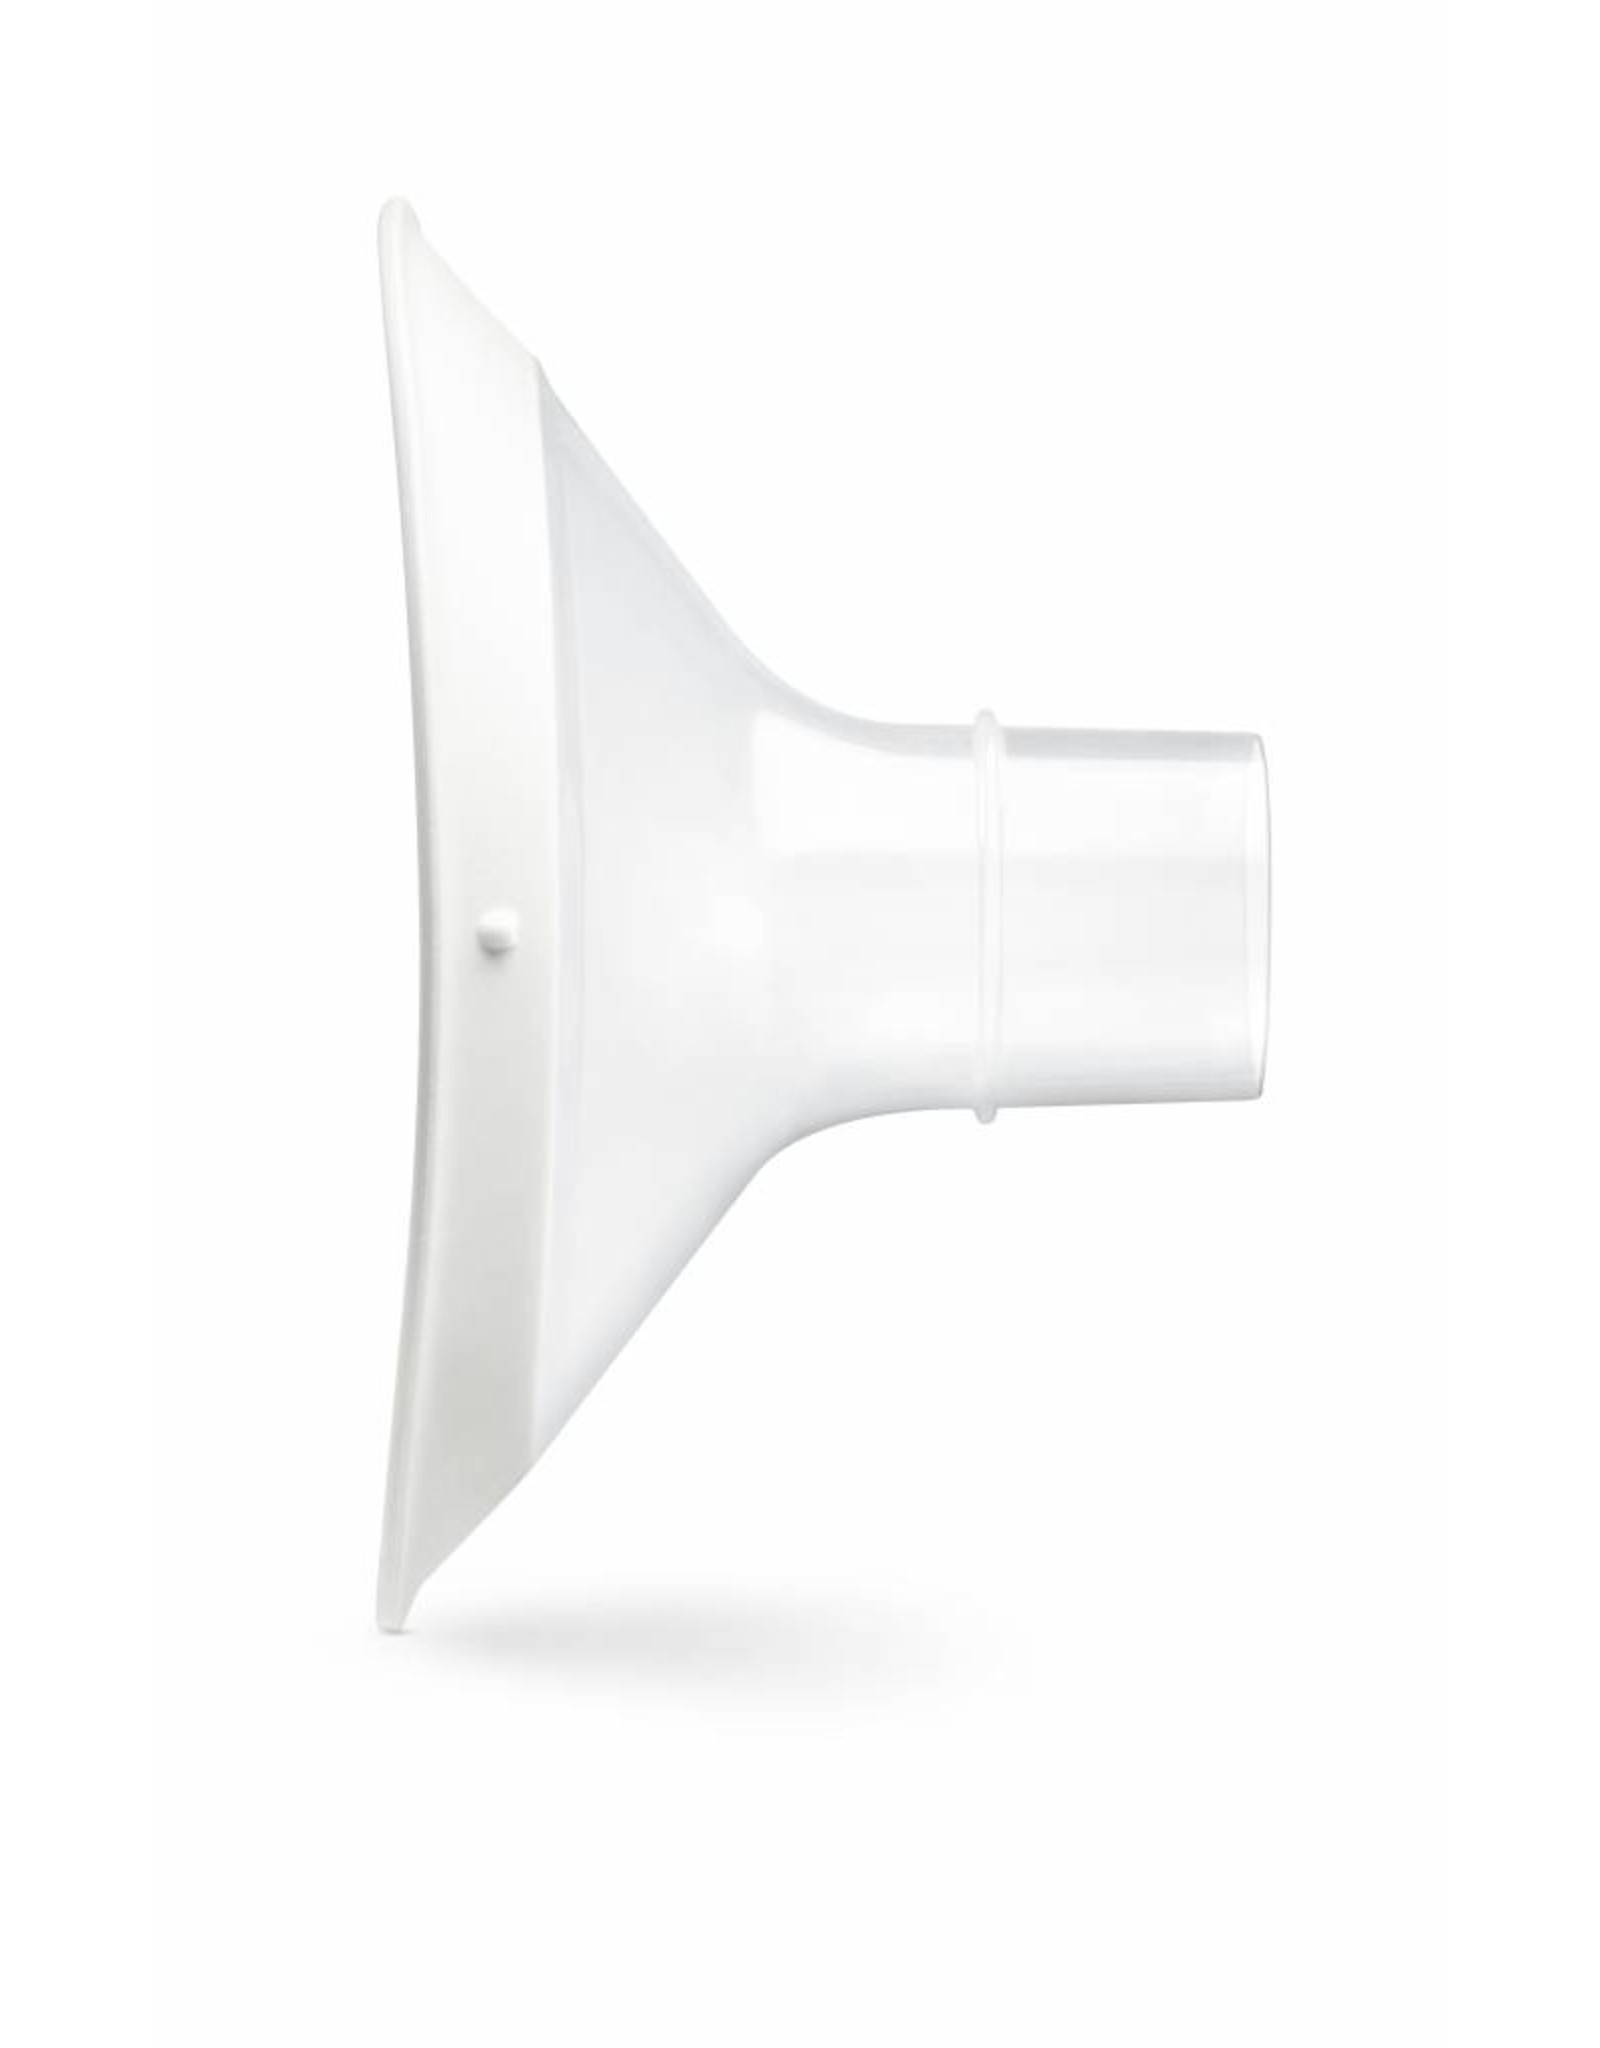 Medela Medela PersonalFit Flex, 2 Brusthauben Grösse L (27mm)